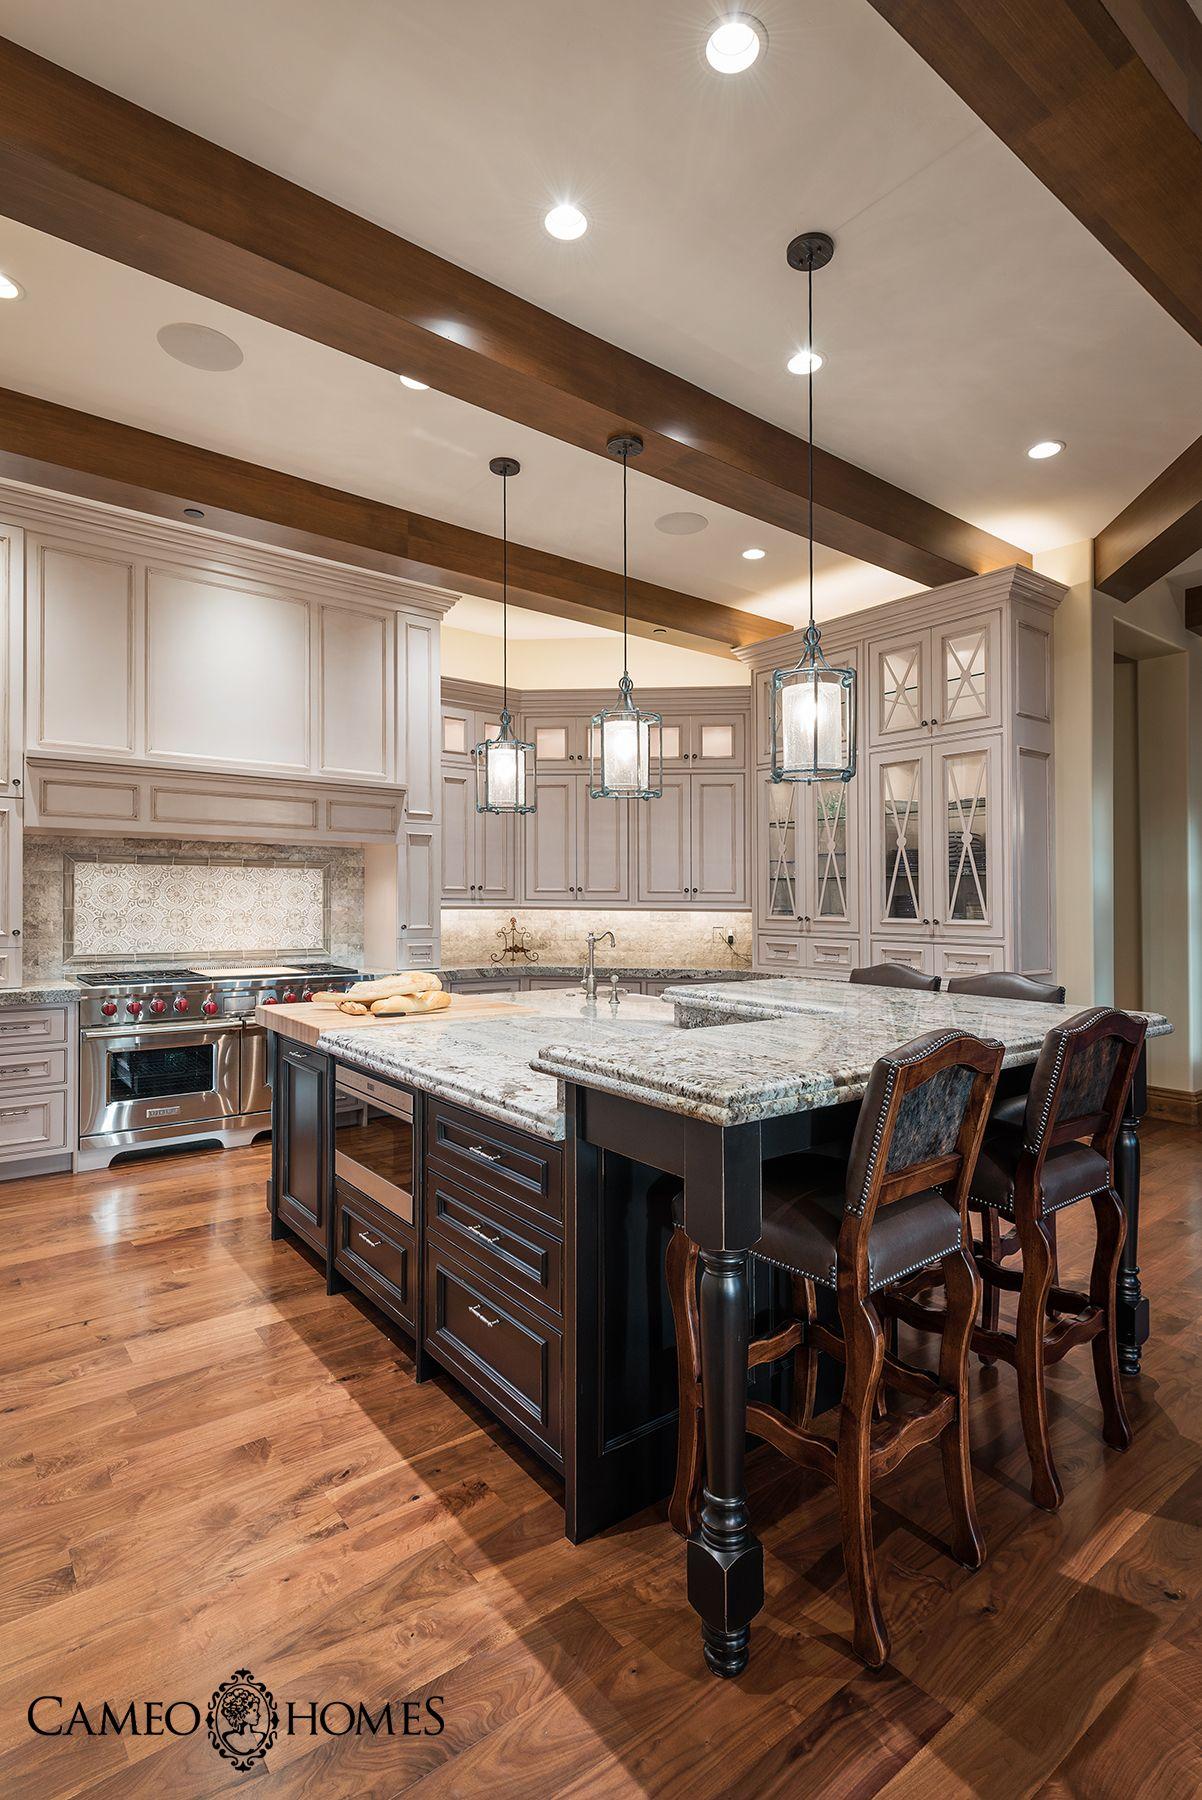 Superb Kitchen Island. Cabinets By Highline Cabinets. MHR Interior Design. Utah  Home Builder